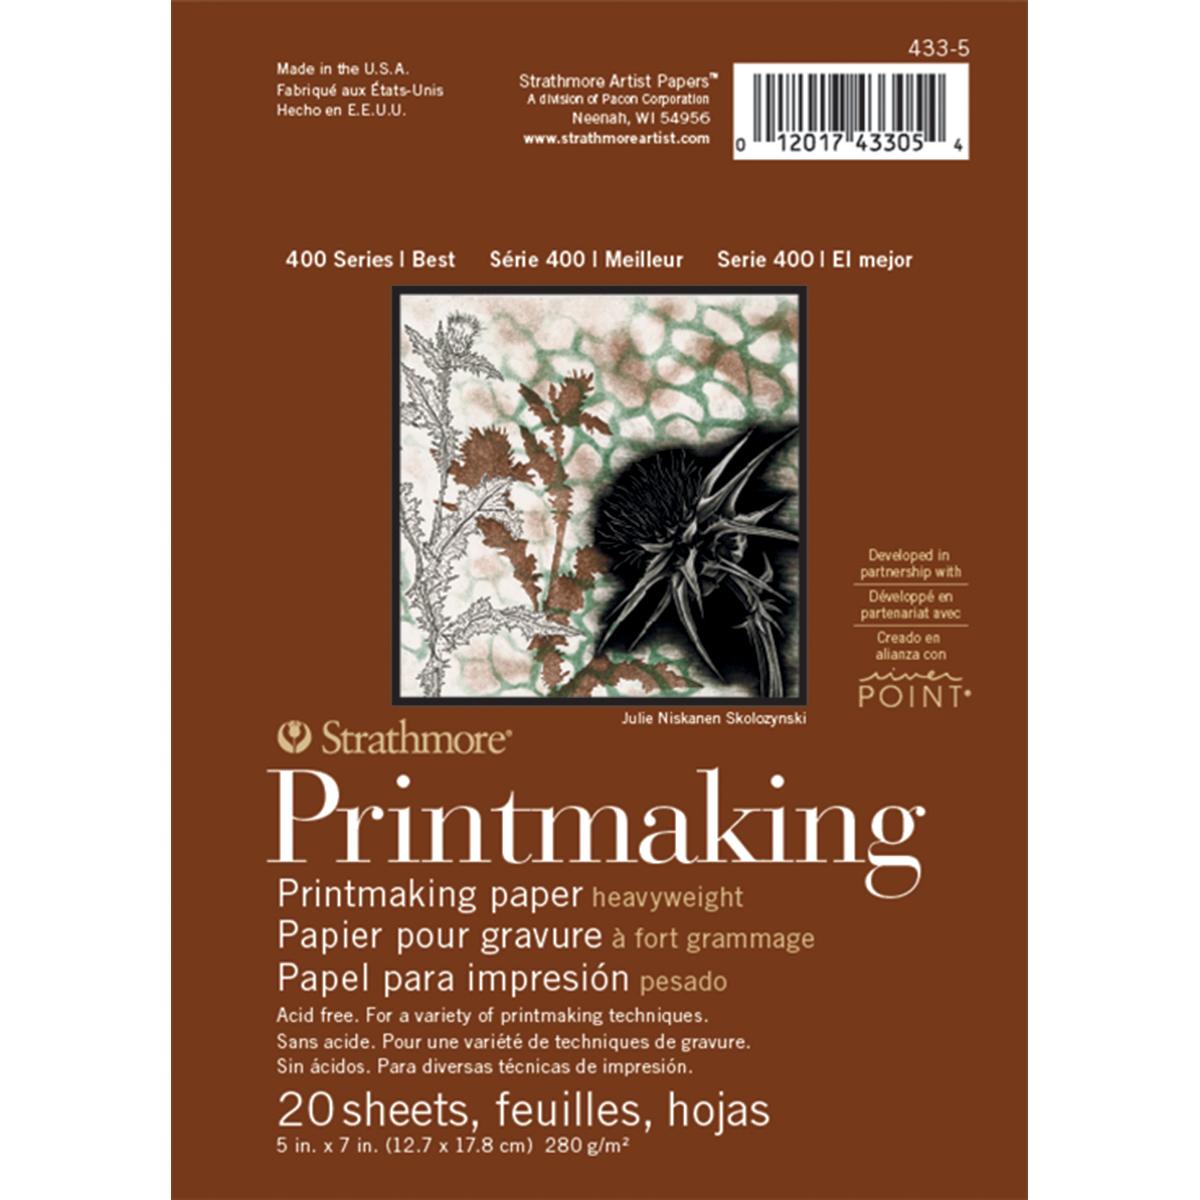 "Strathmore 5"" x 7"" Heavyweight Printmaking Paper"